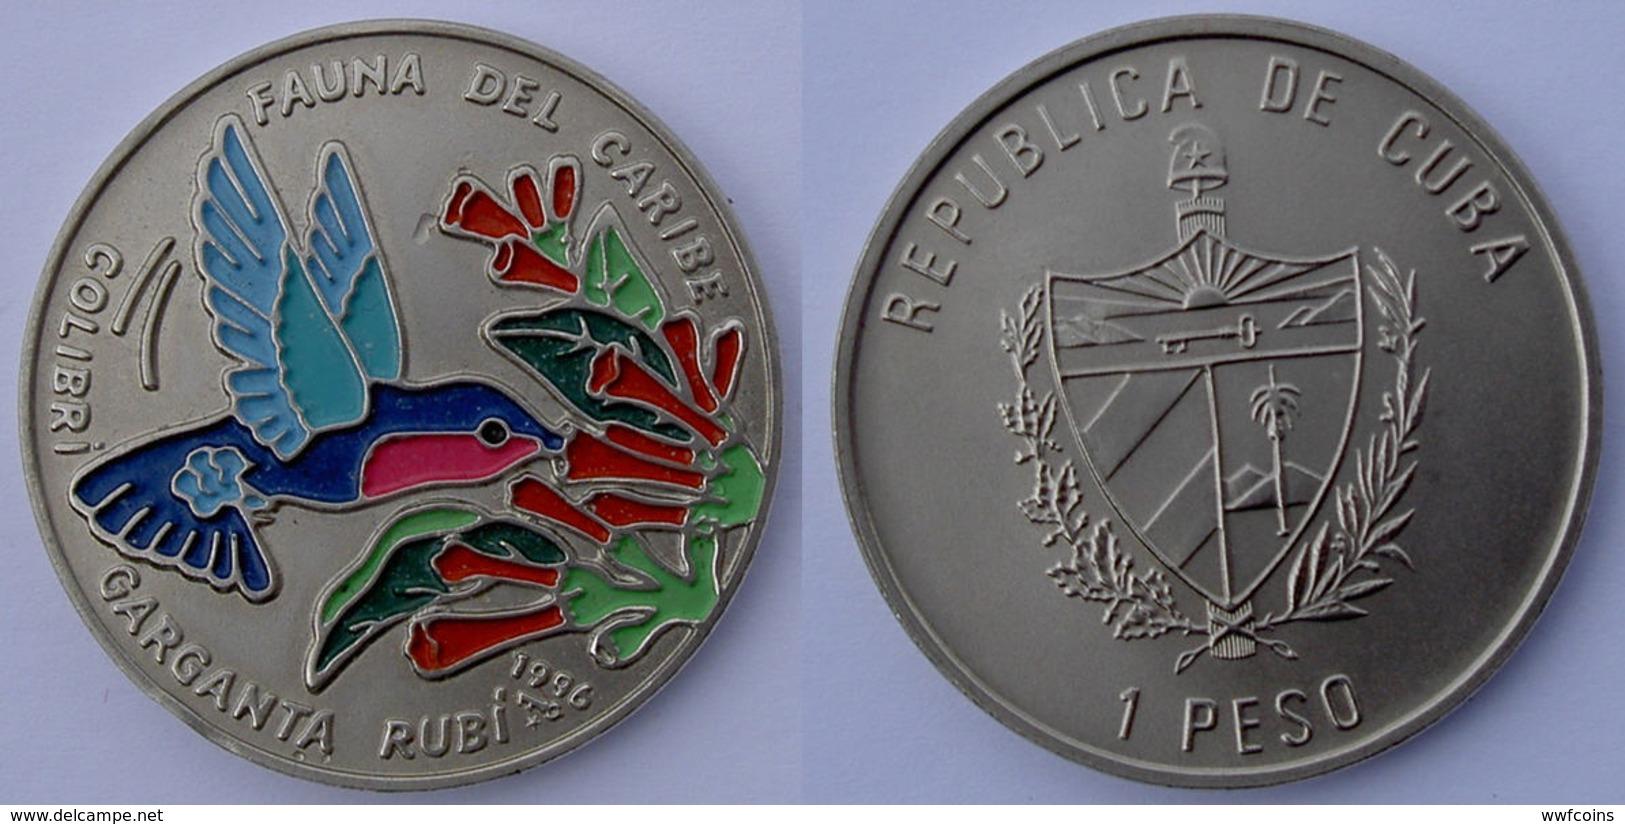 CARIBBEAN STATE 1 P 1996 FAUNA DEL CARIBE COLIBRì GARGANTA RUBI WWF ENDANGERED WILDLIFE BIRD - Cuba